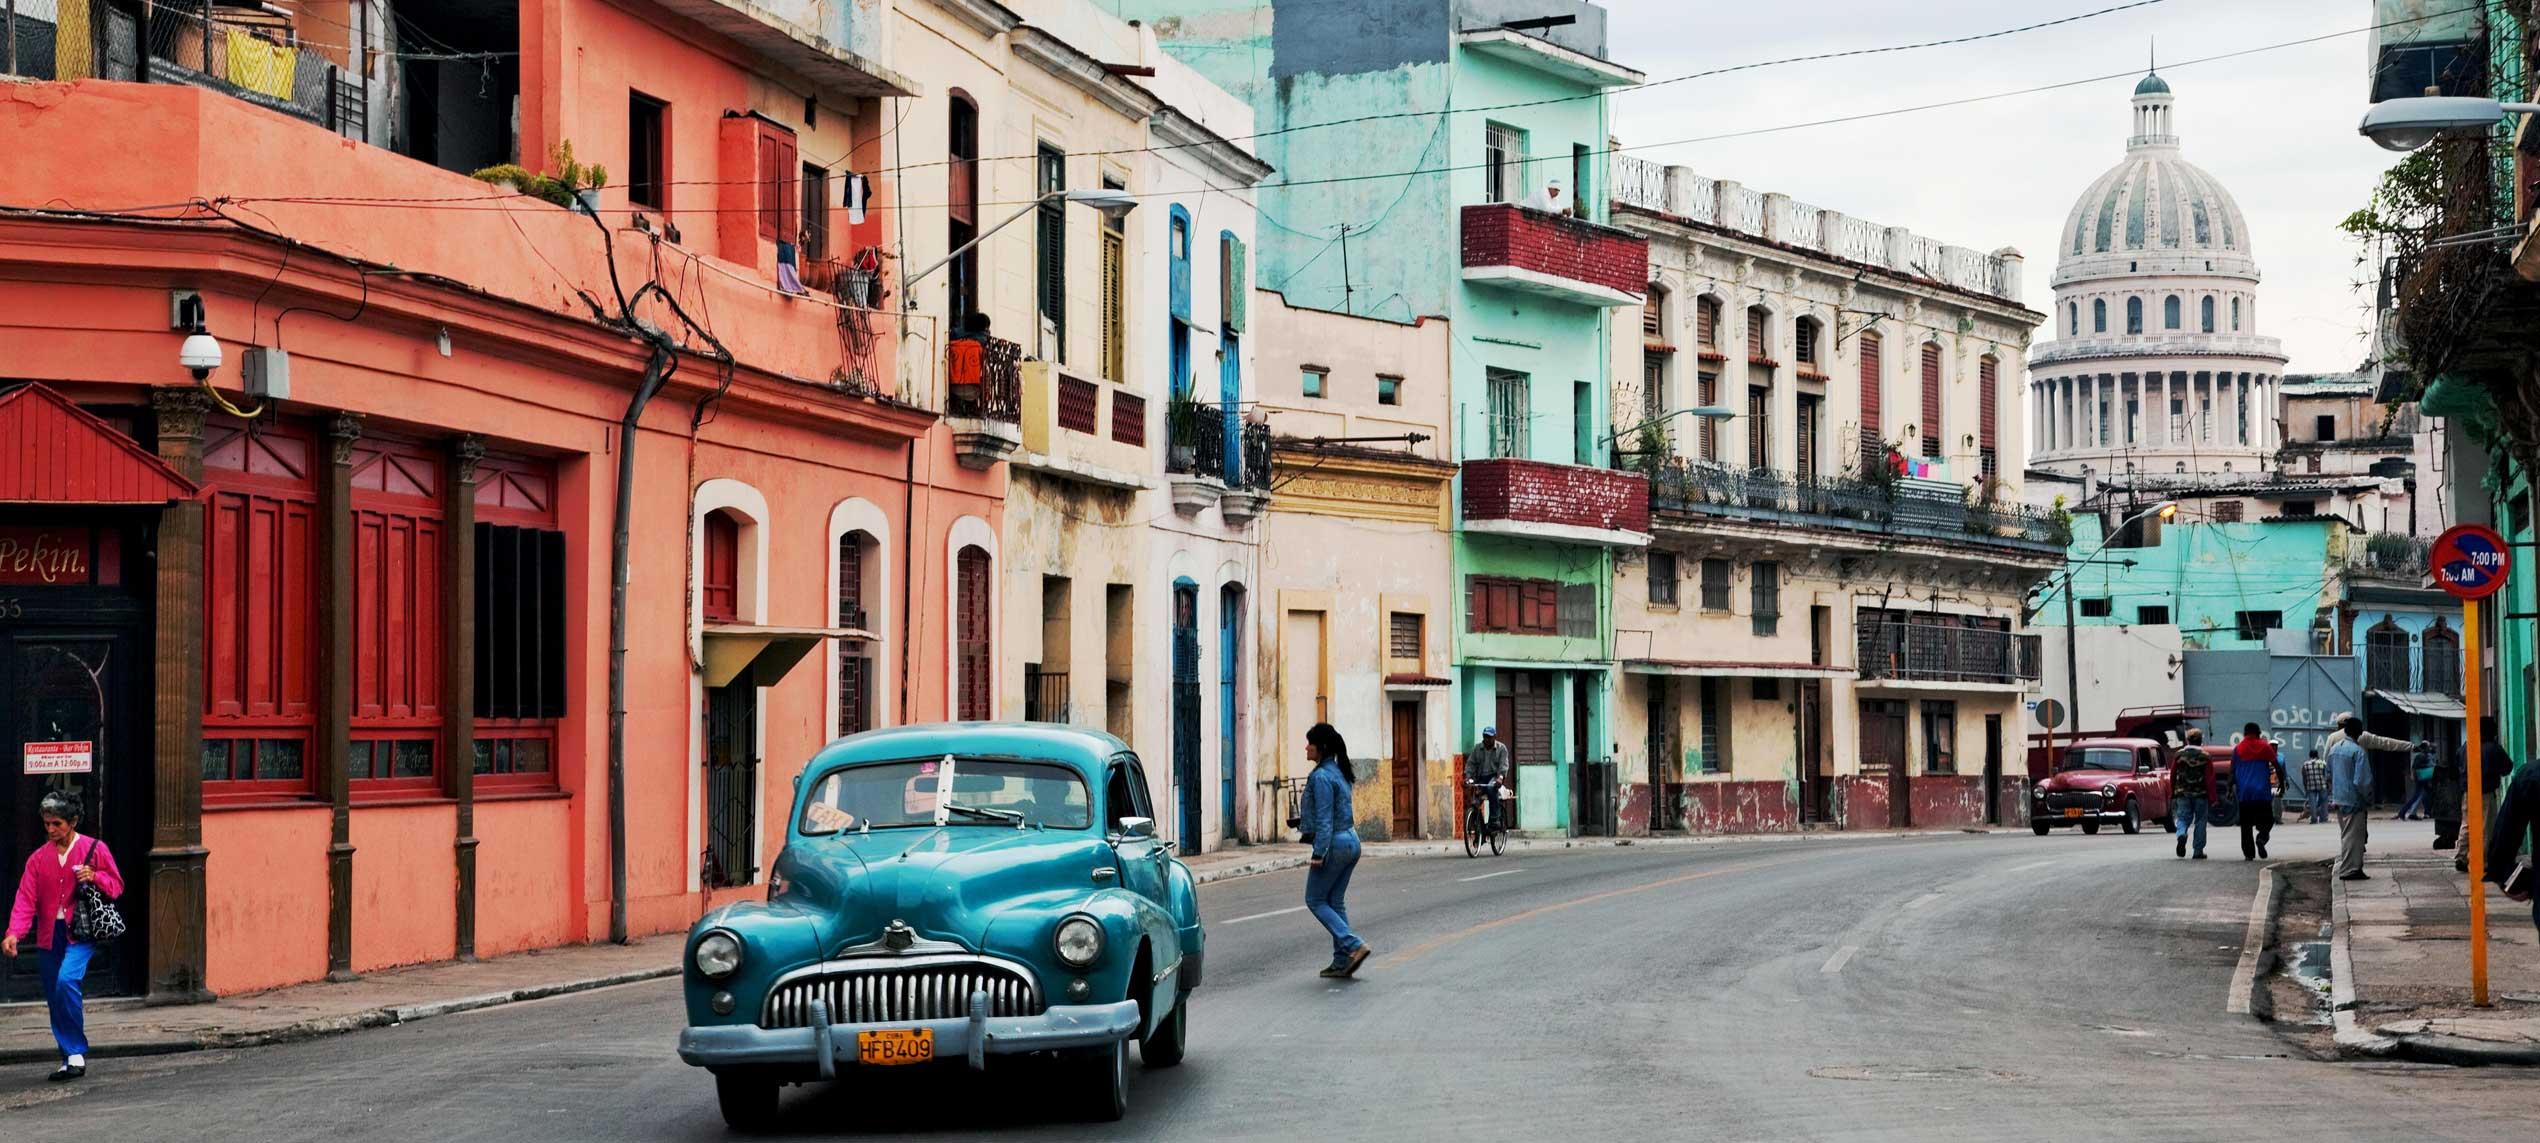 هاوانا، کوبا